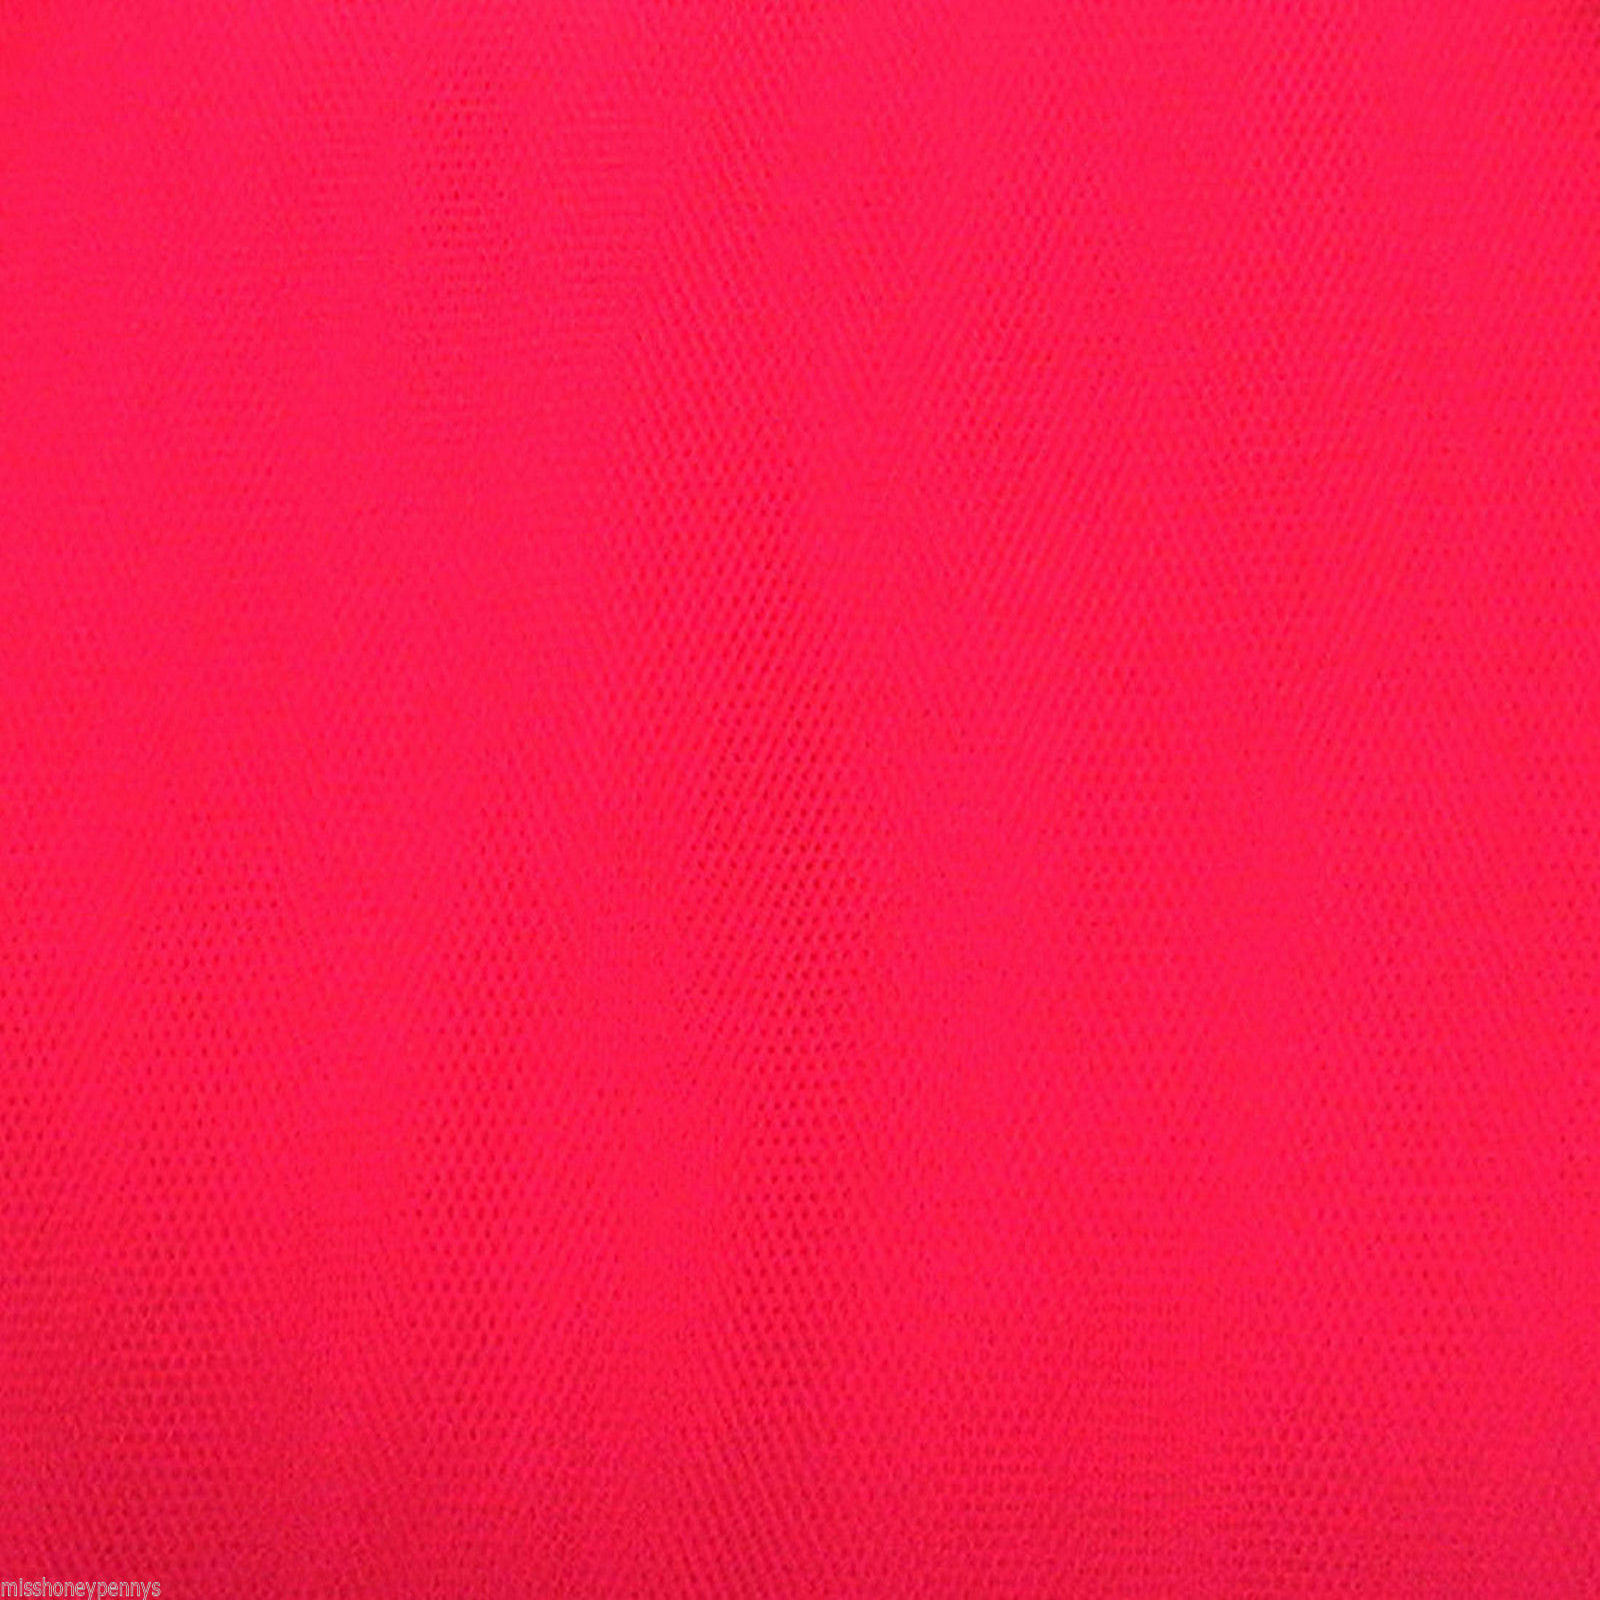 NEON CERISE PINK TUTU 80s FANCY DRESS NET TULLE FABRIC ...